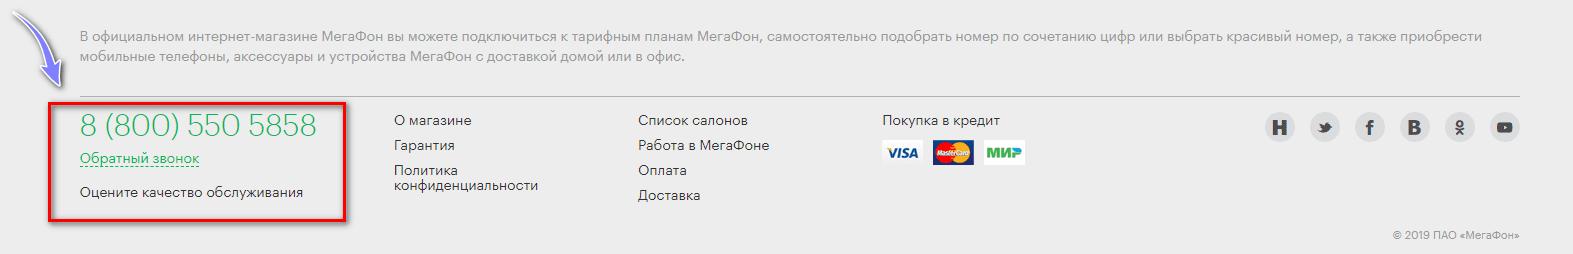 мегафон интернет магазин телефон